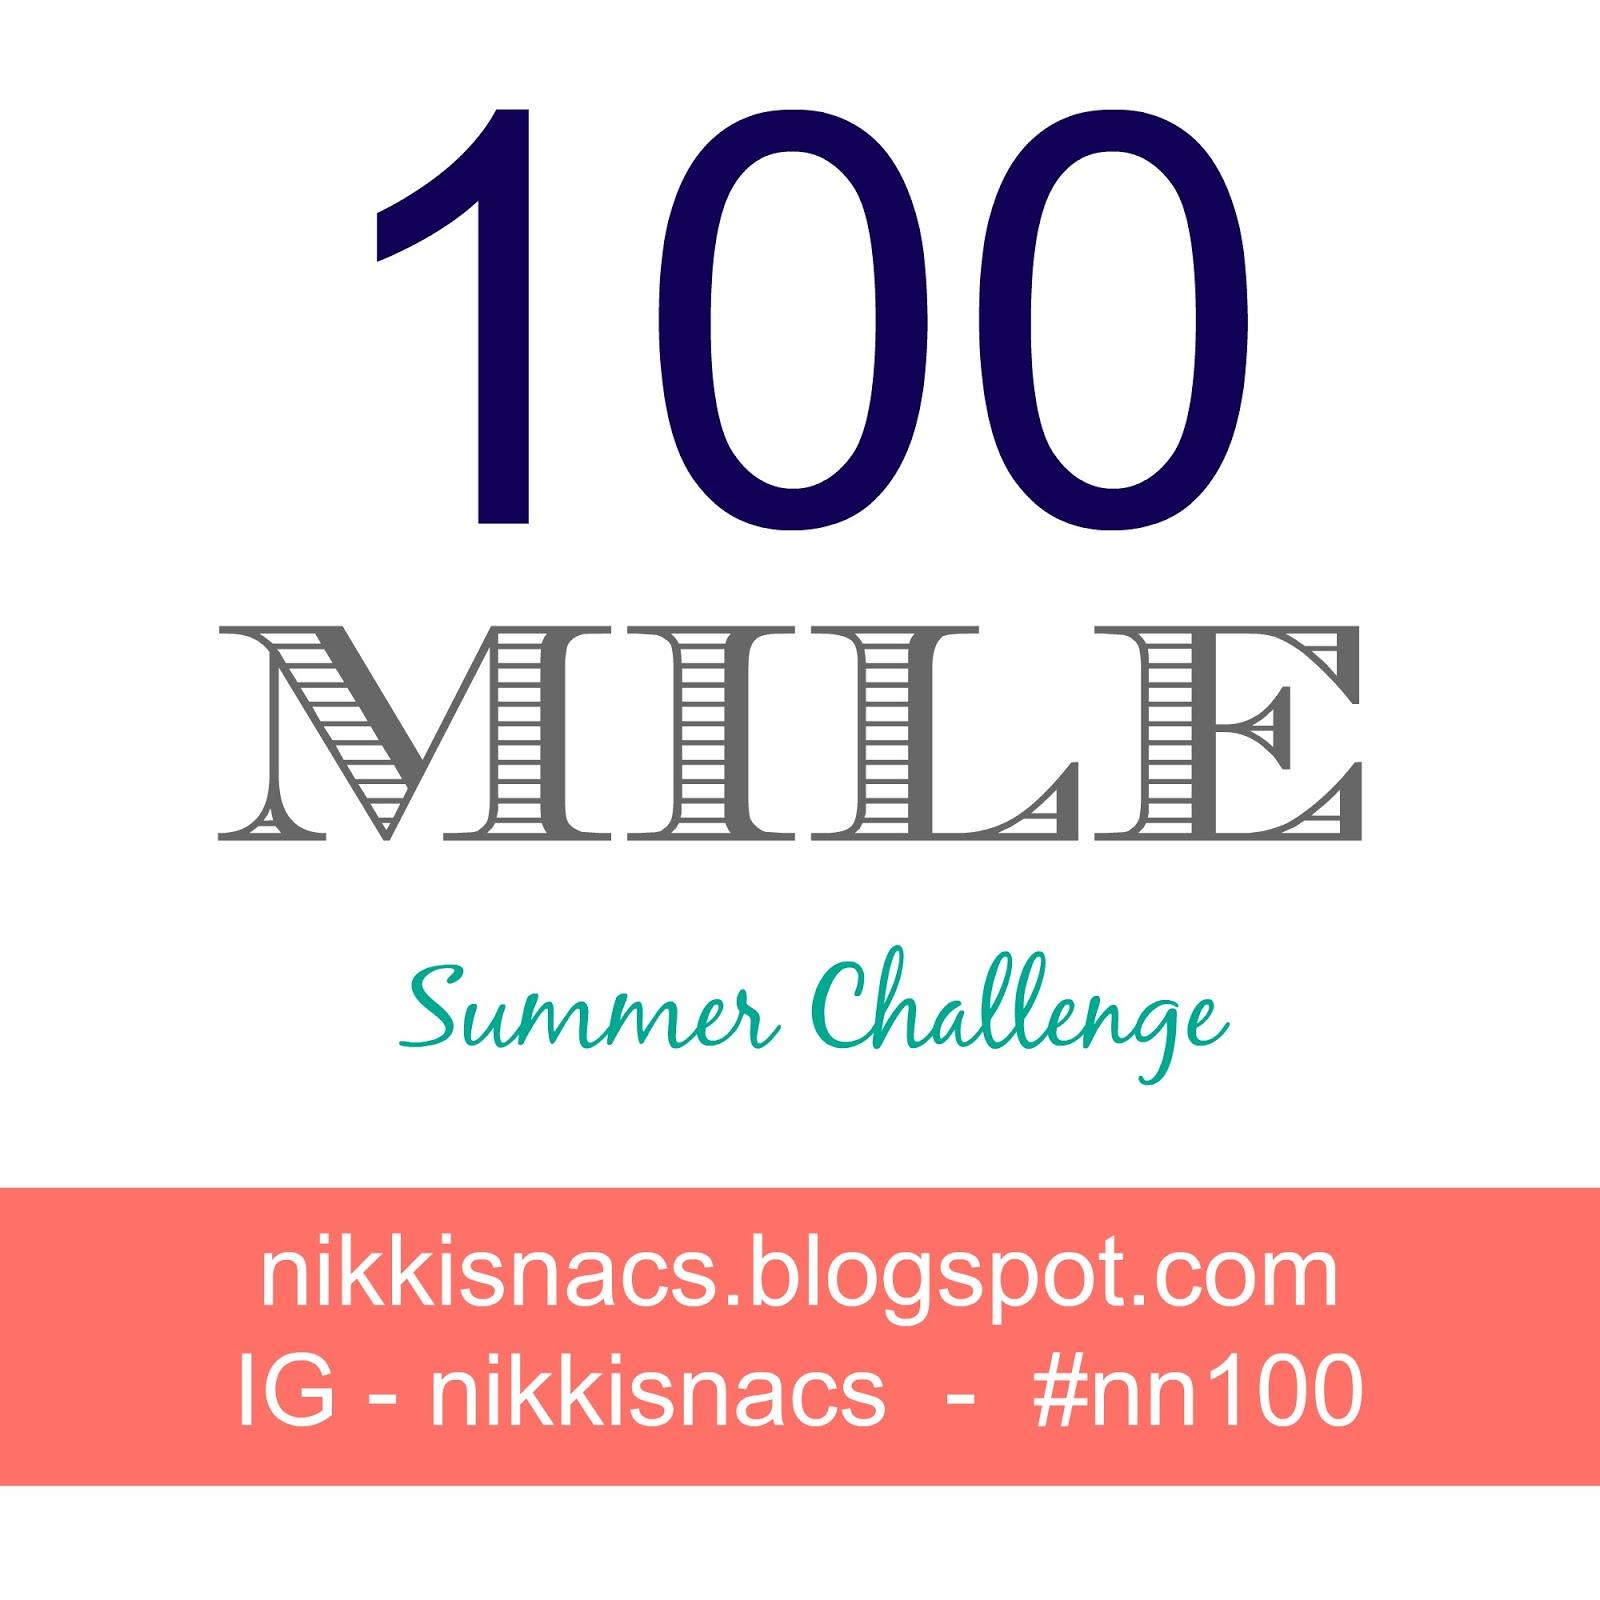 http://nikkisnacs.blogspot.com/2014/06/100-mile-challenge.html